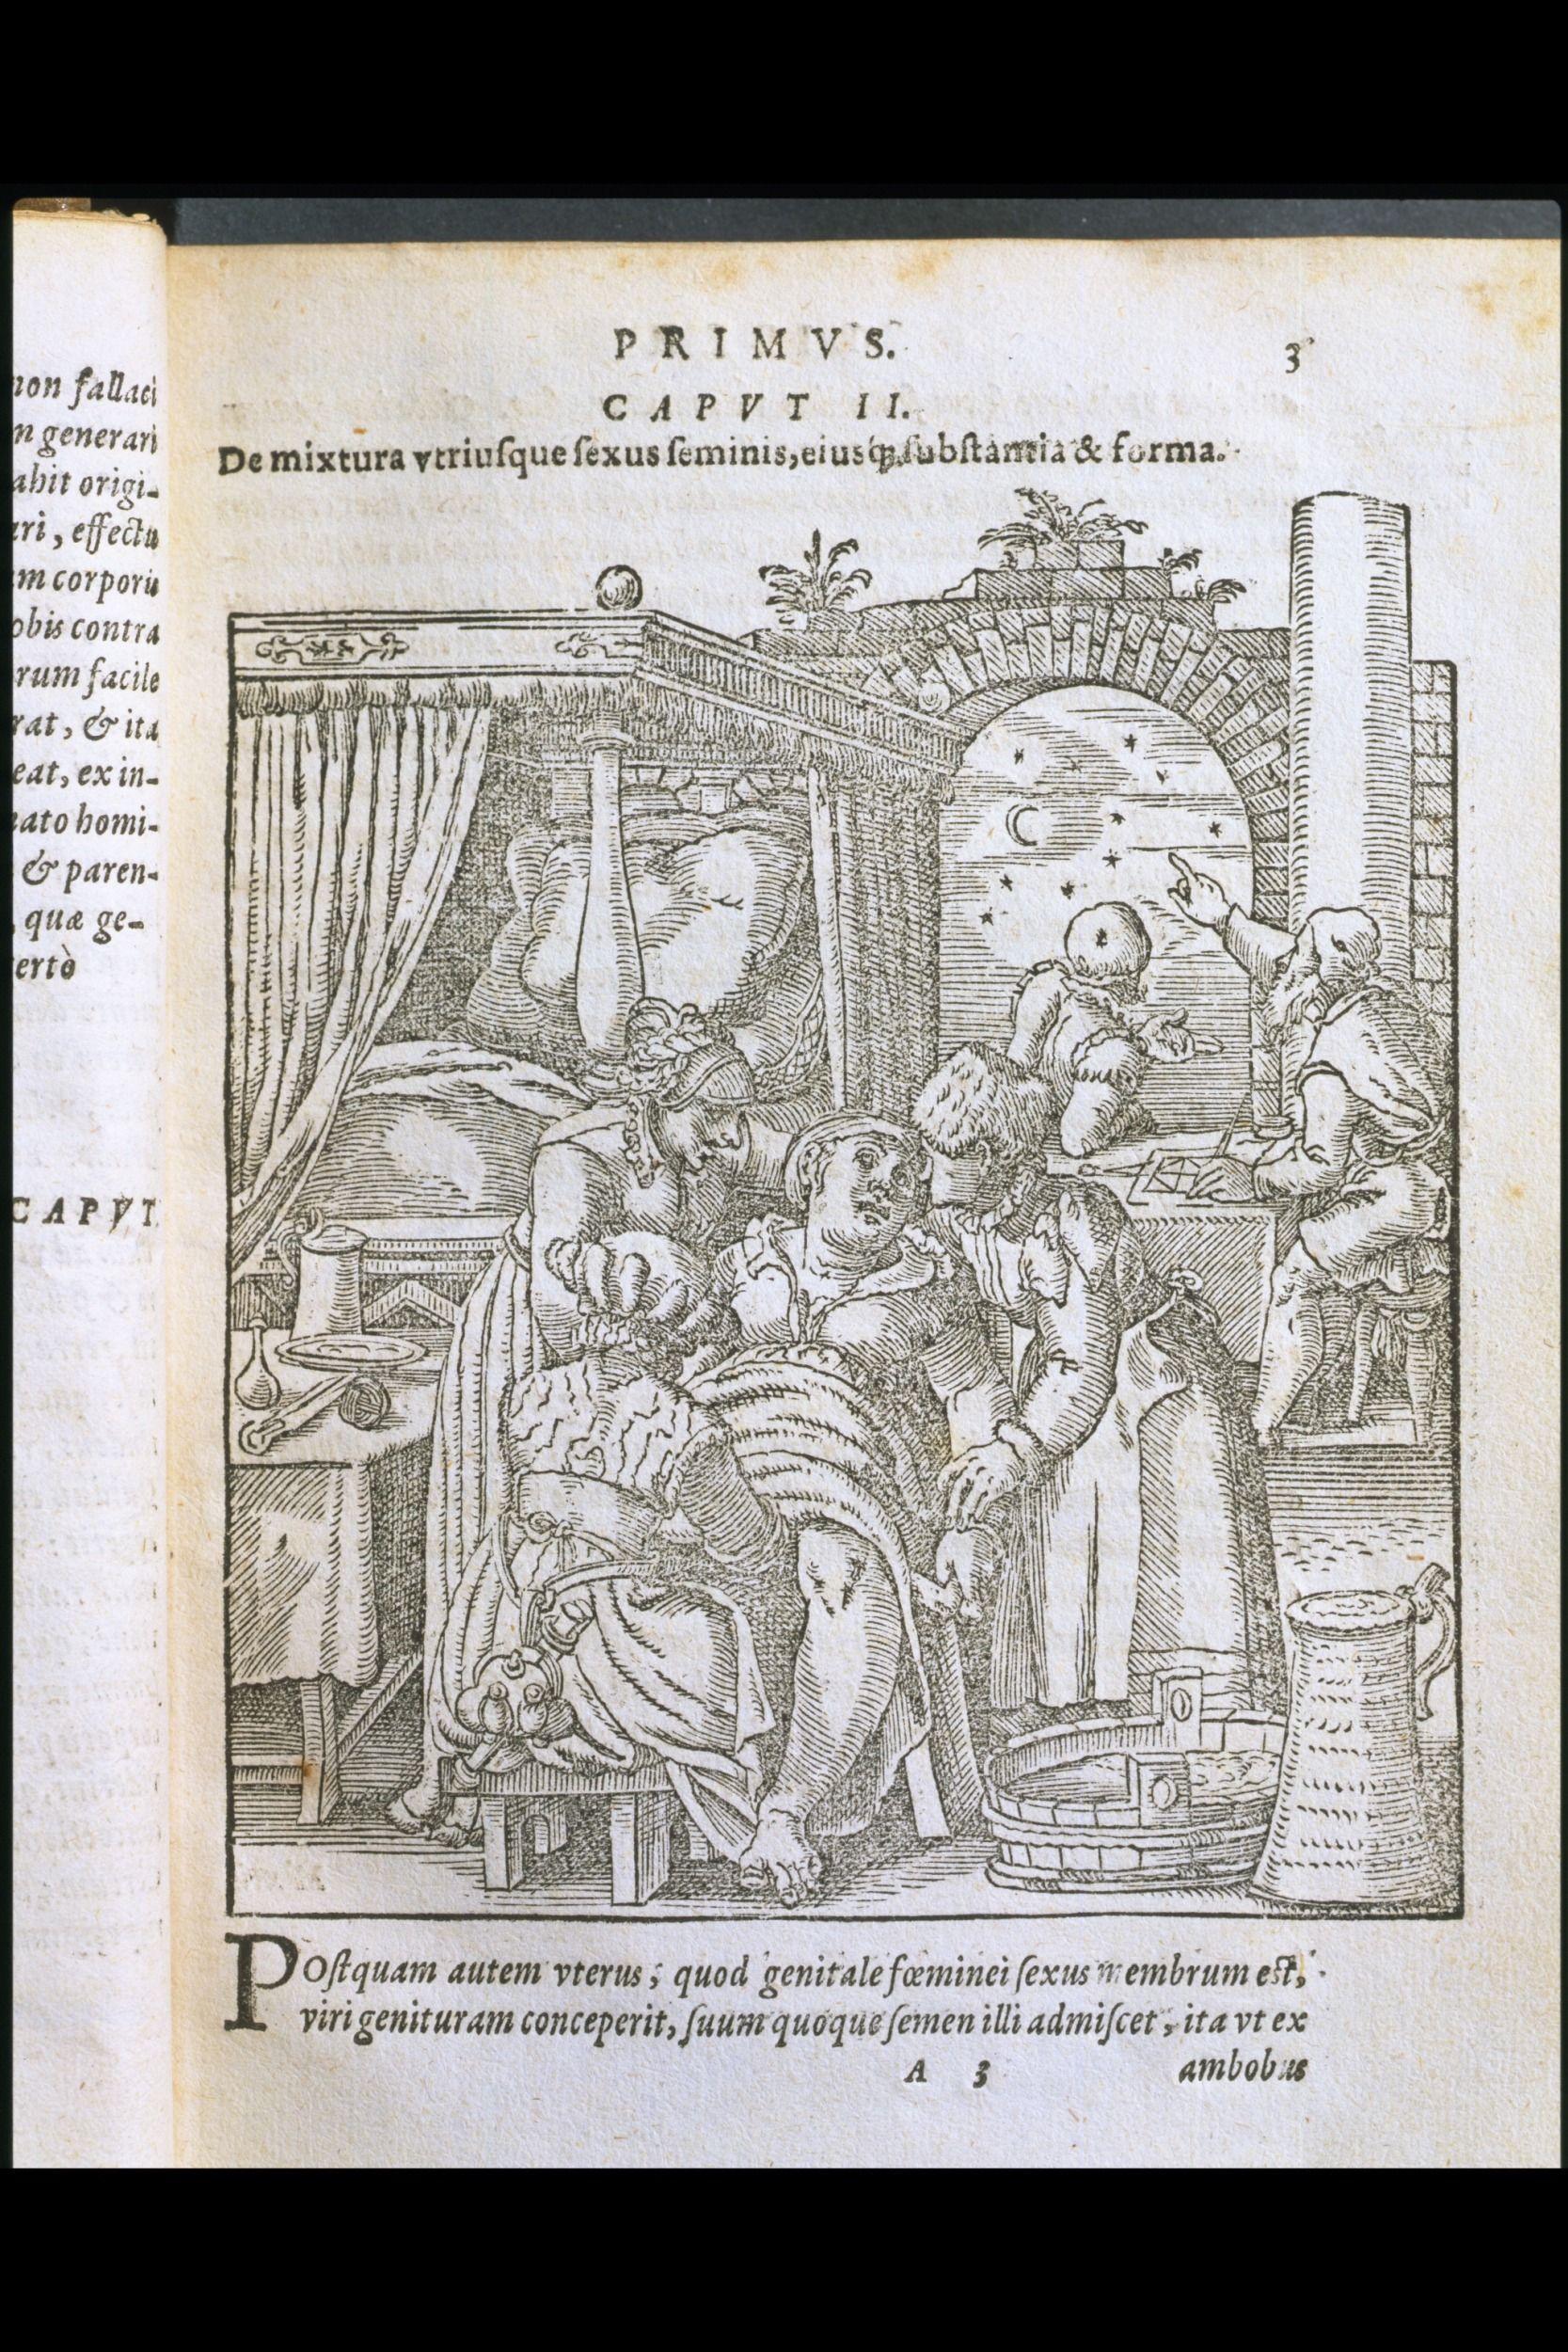 Did 16th Century German Women Wear Fur? 16th century